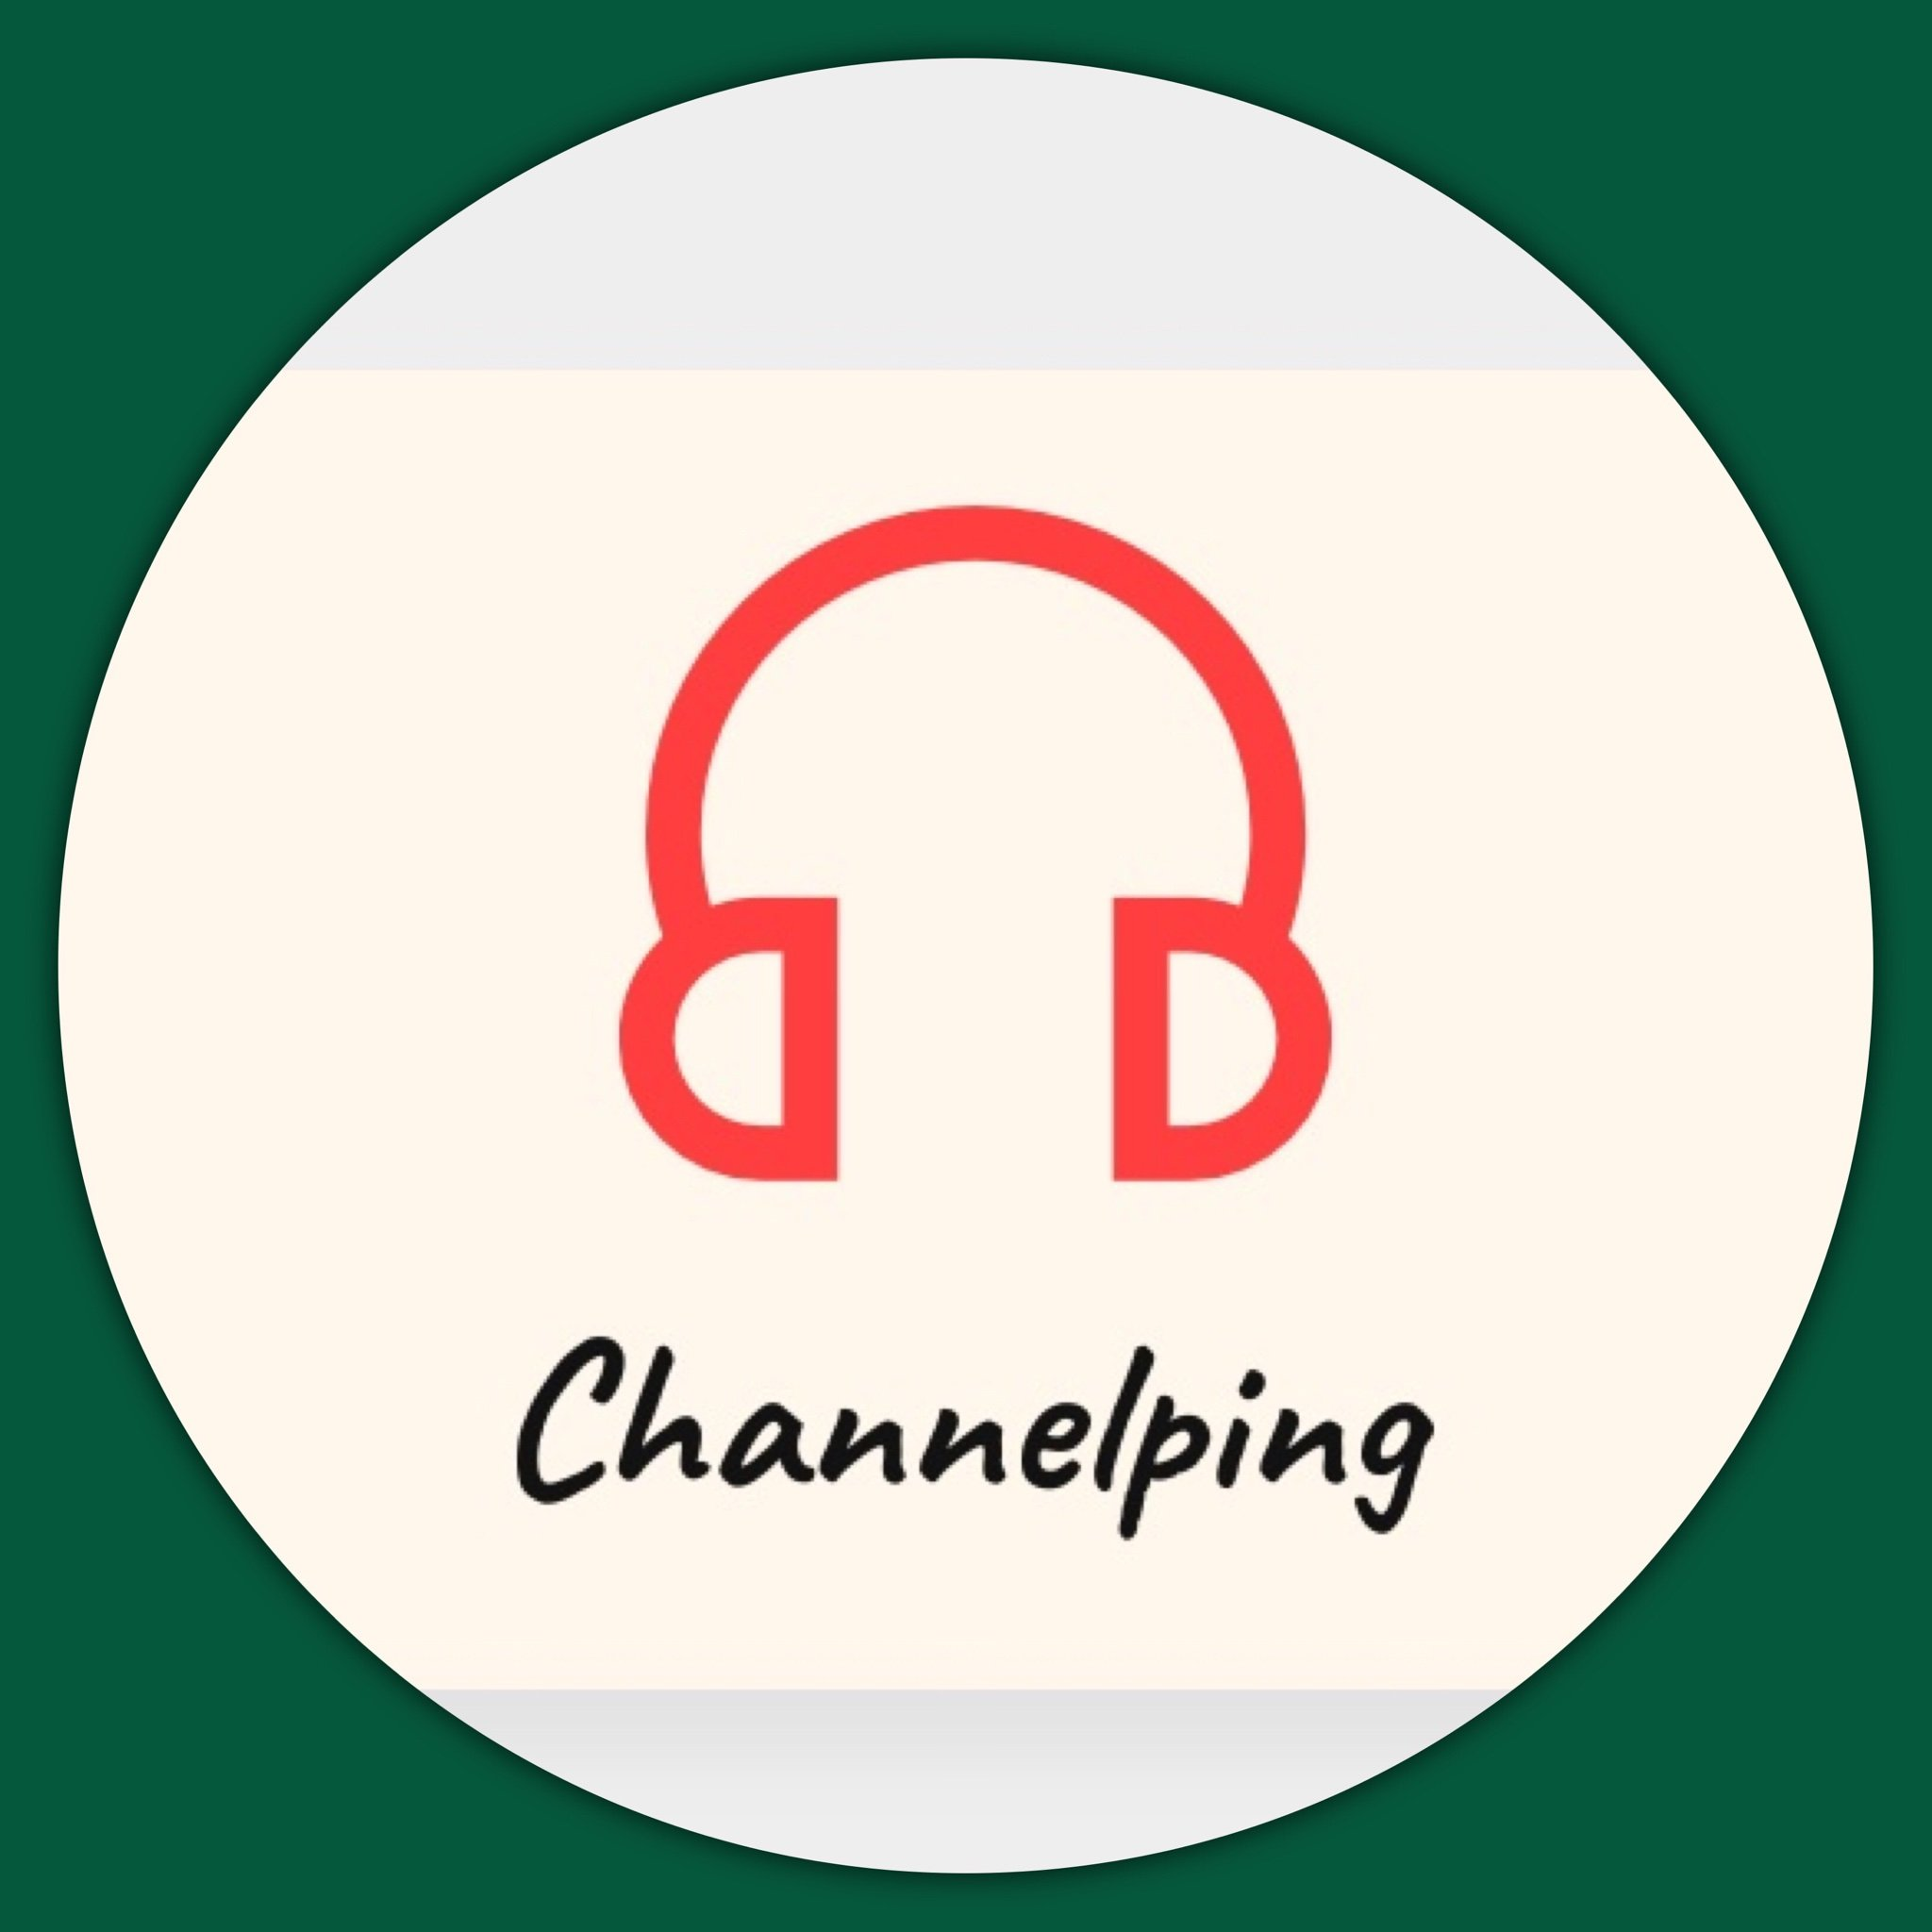 Channelping